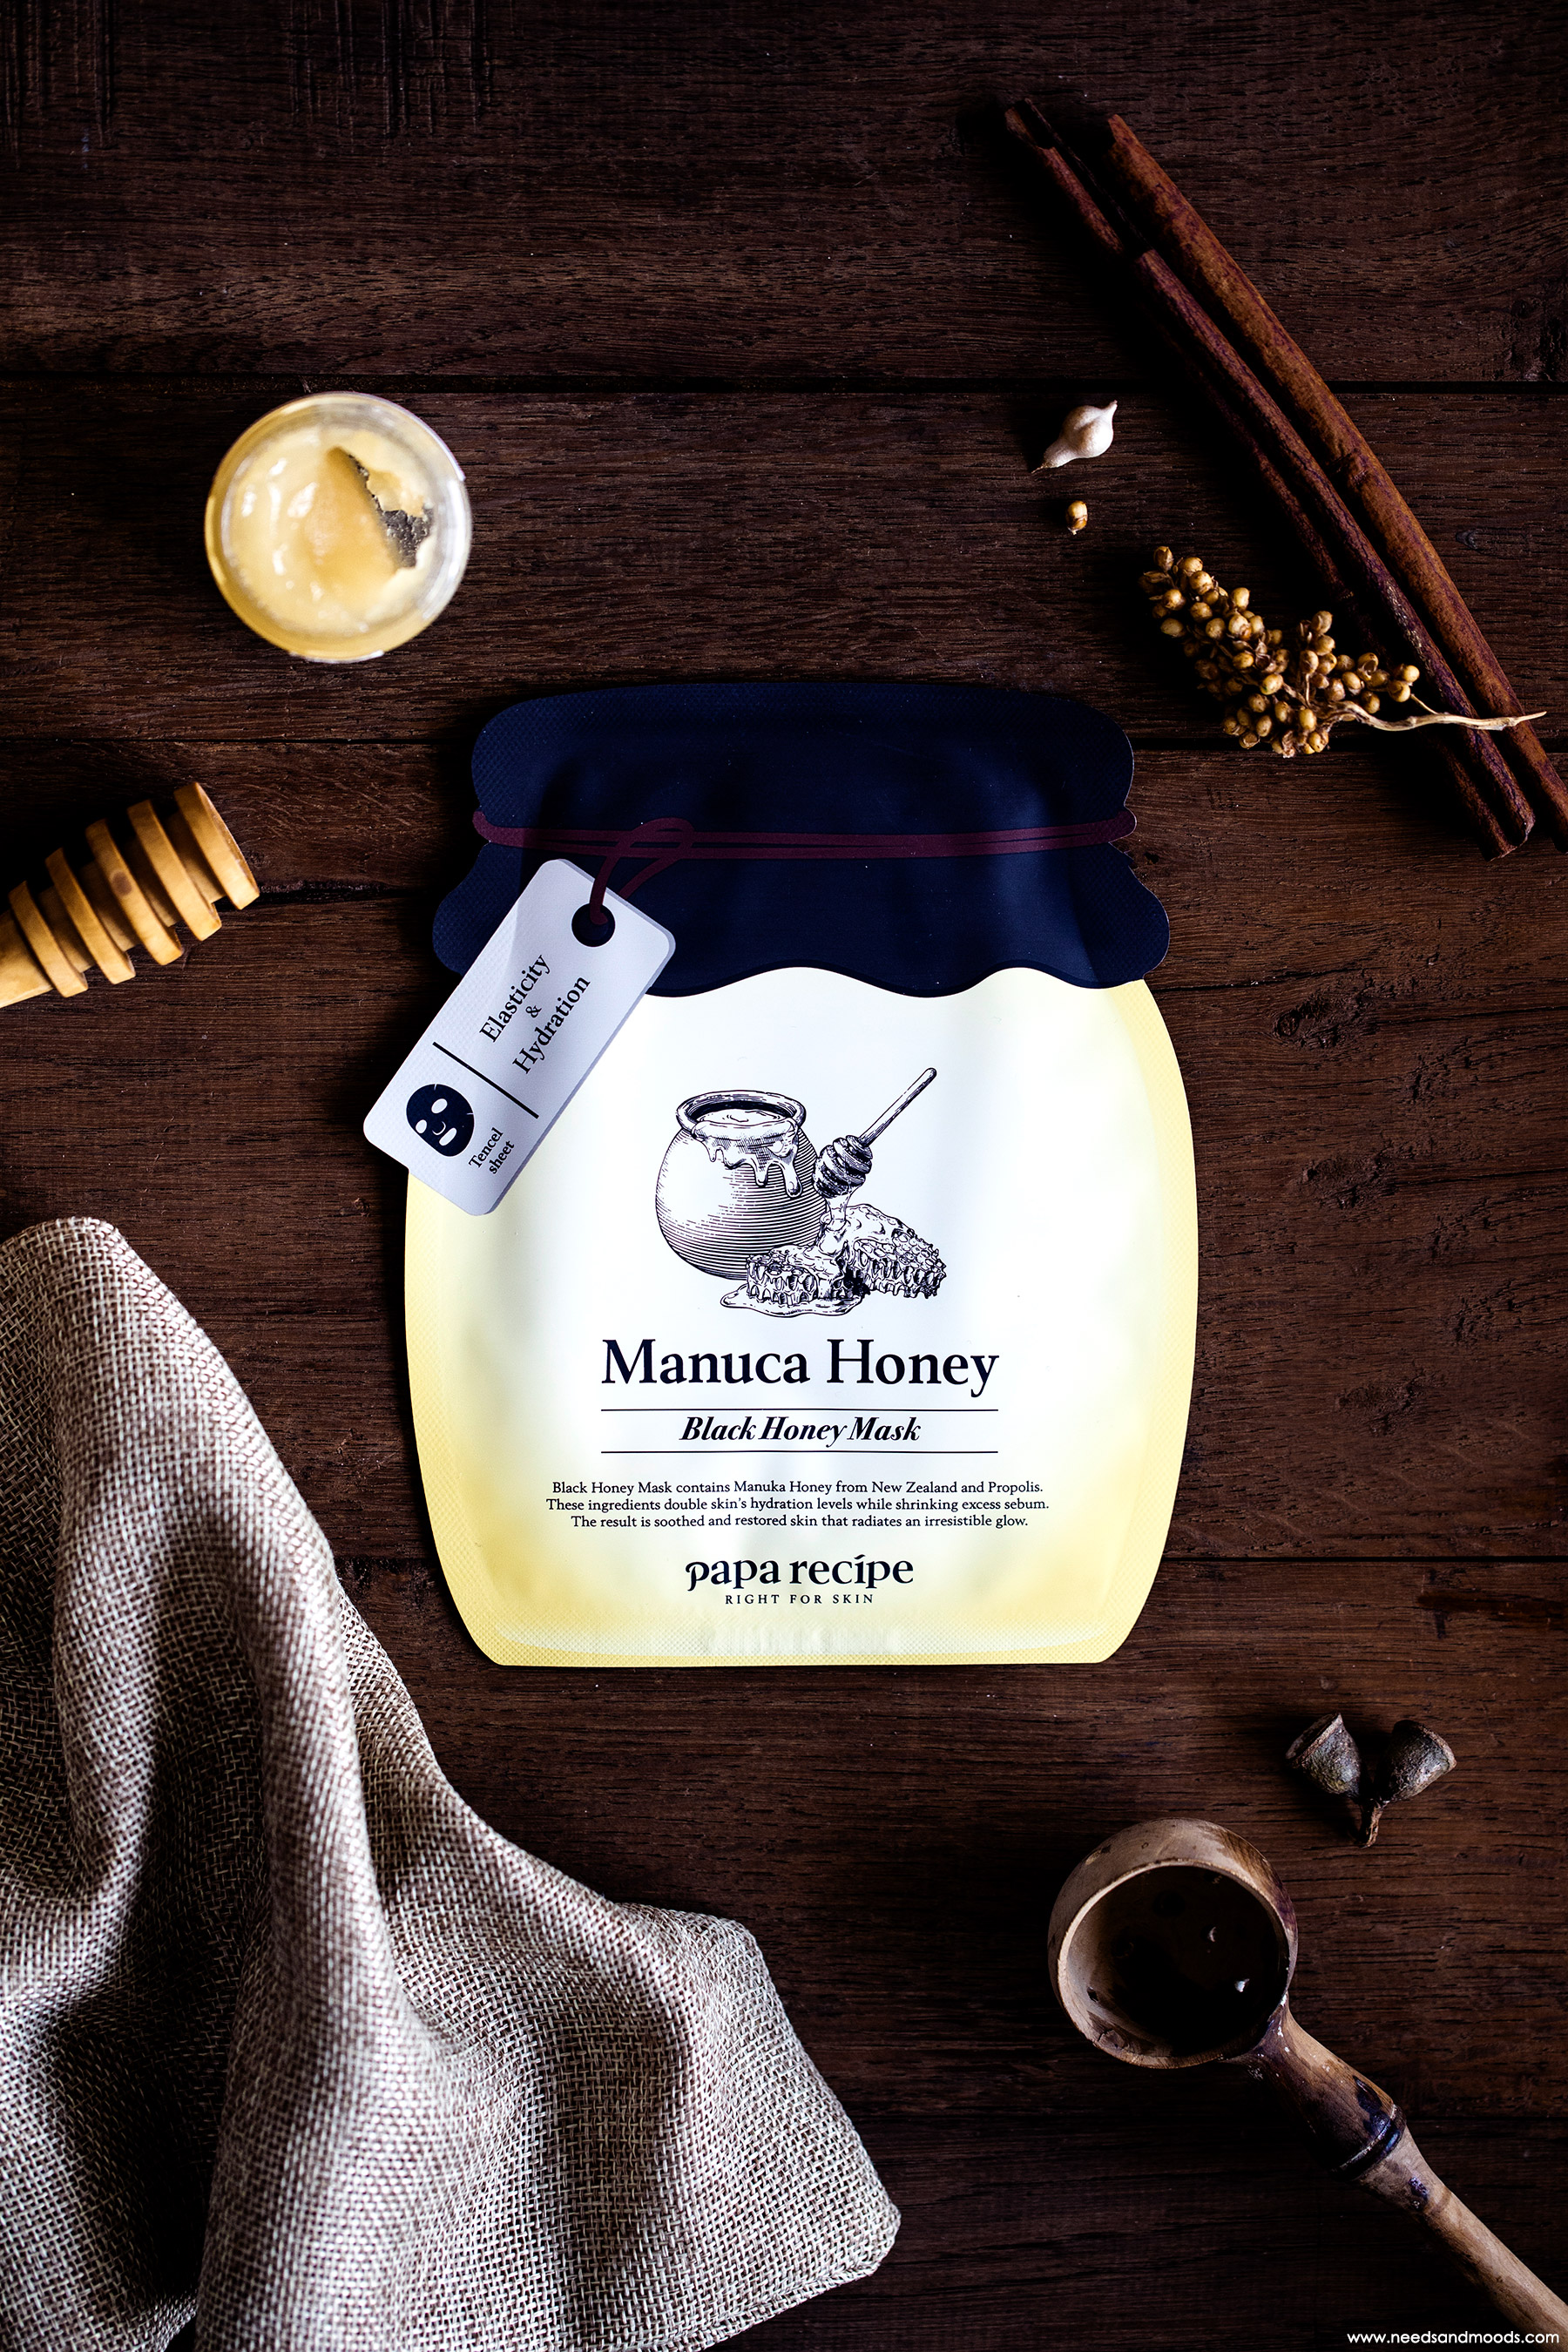 papa recipe manuca black honey mask